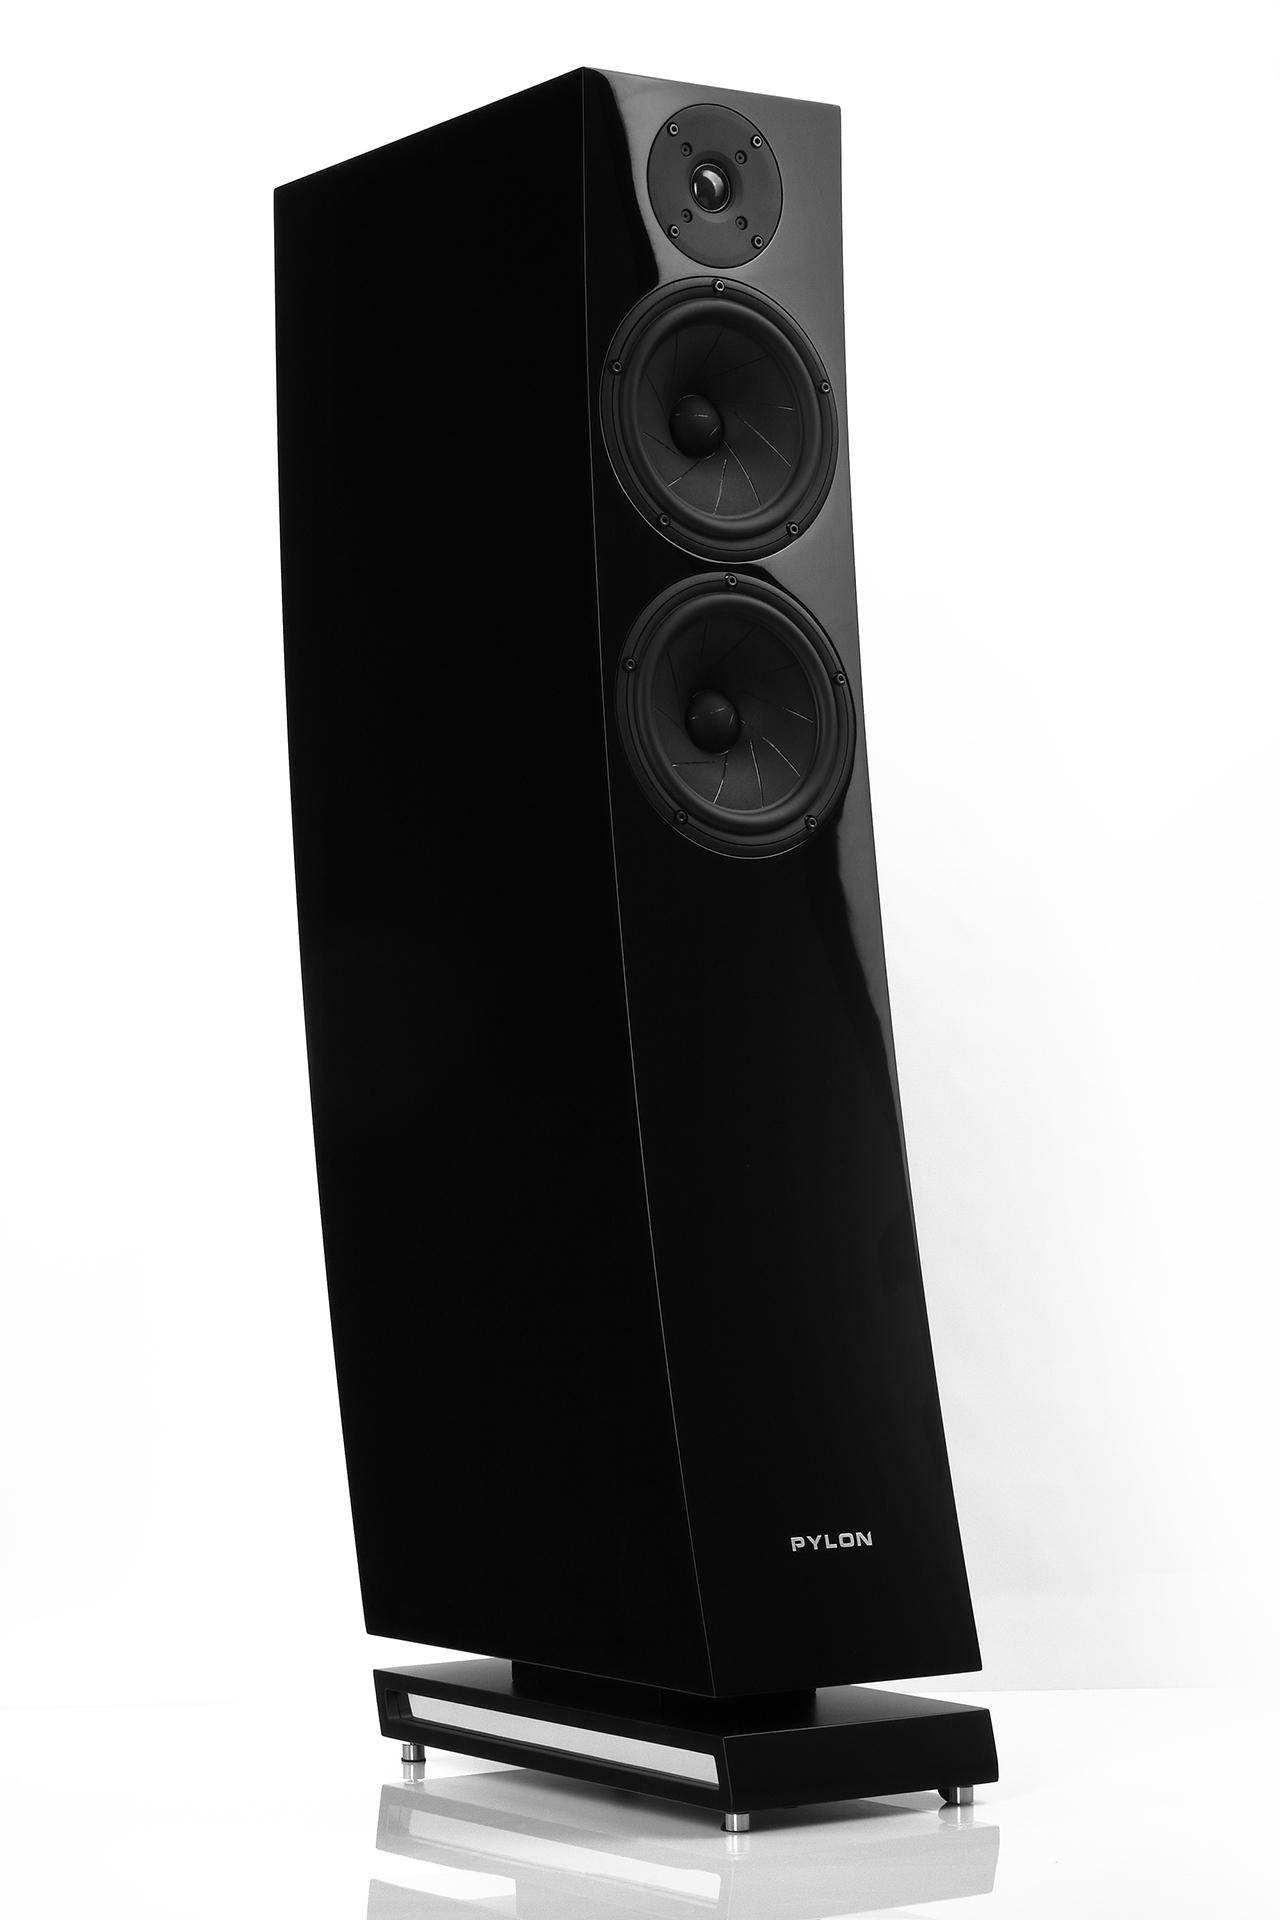 jasper 25 pylon audio_1.jpg